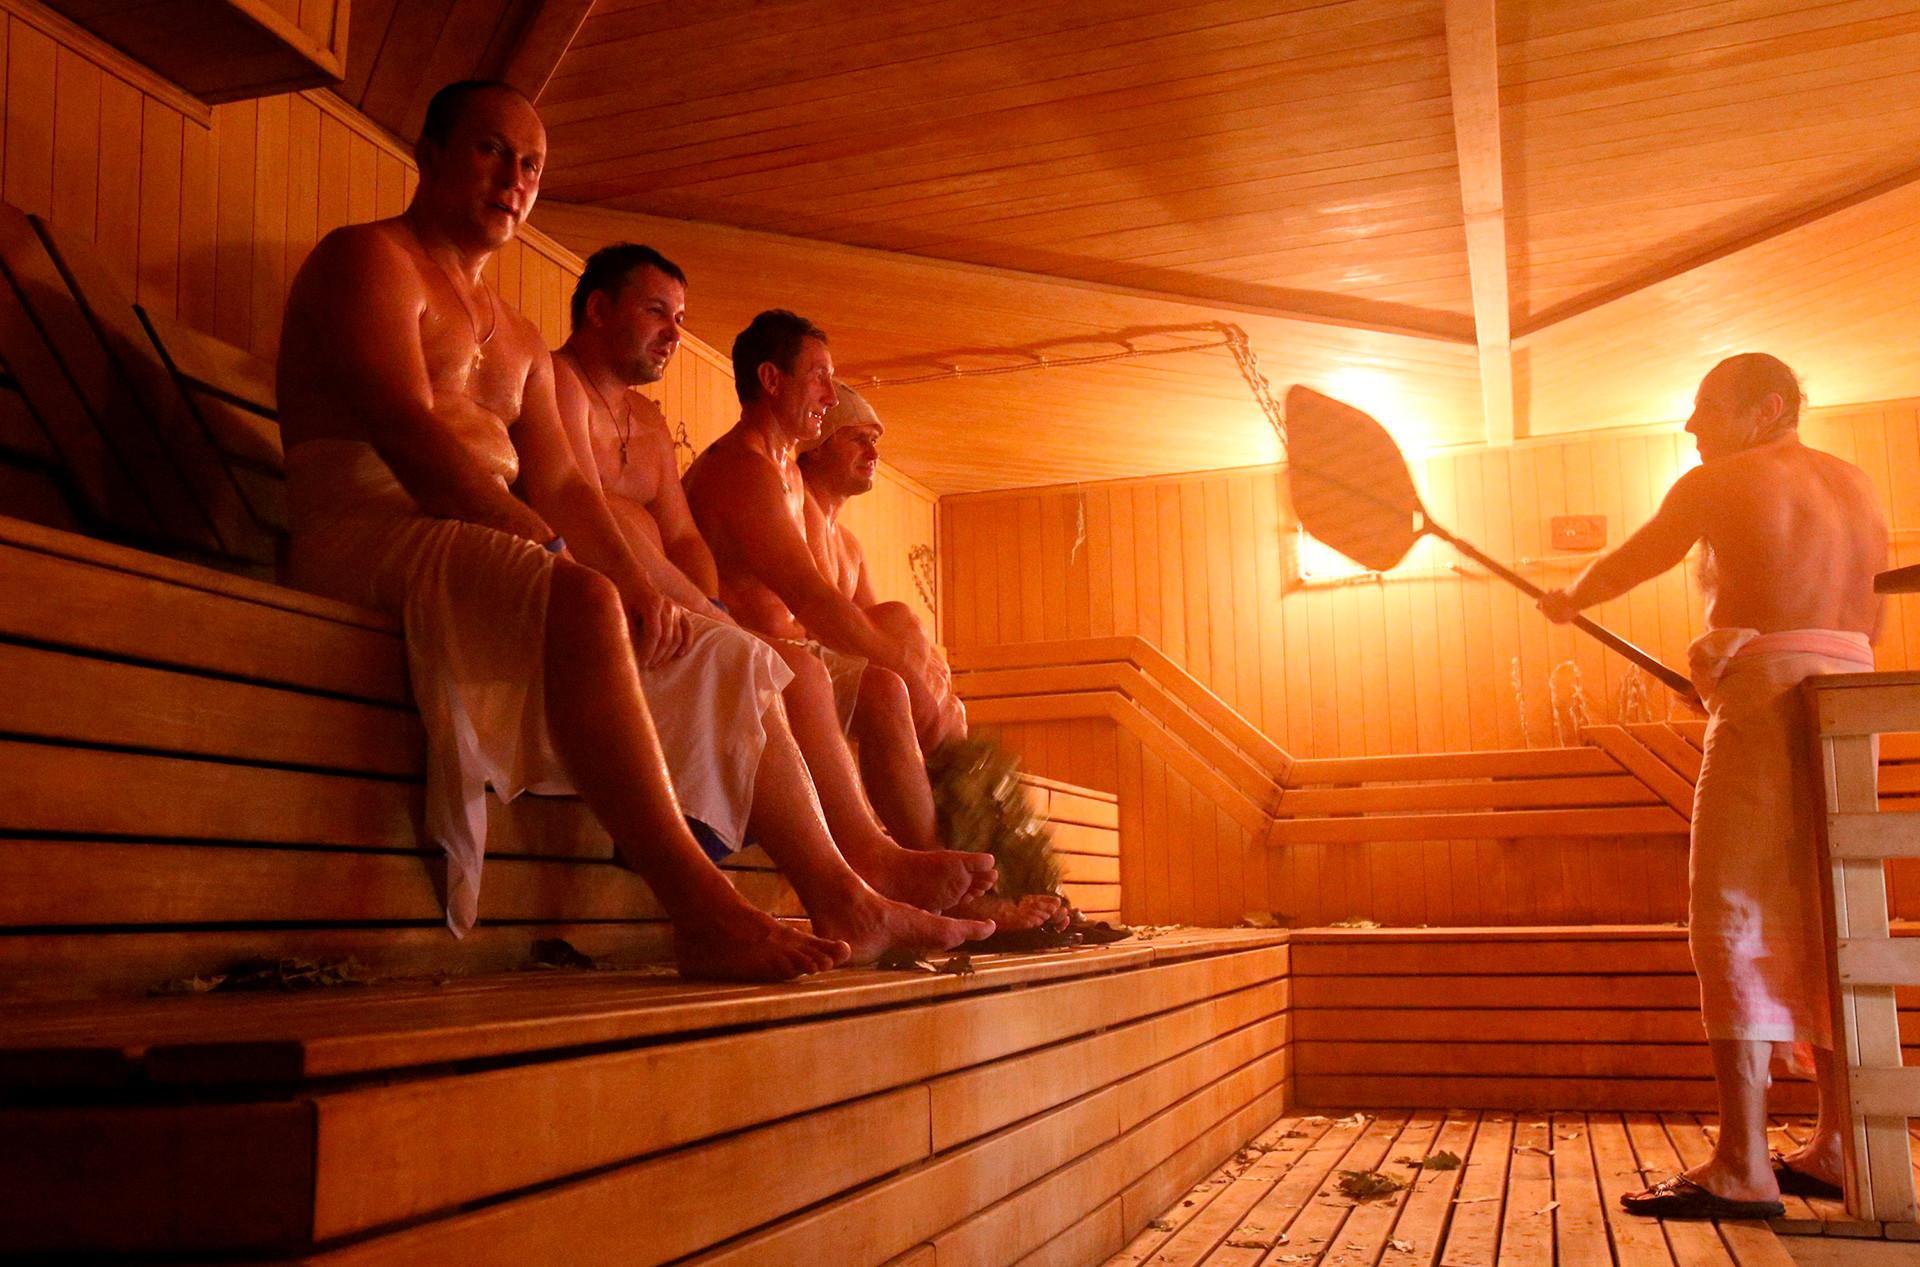 Rublevskie bani sauna complex